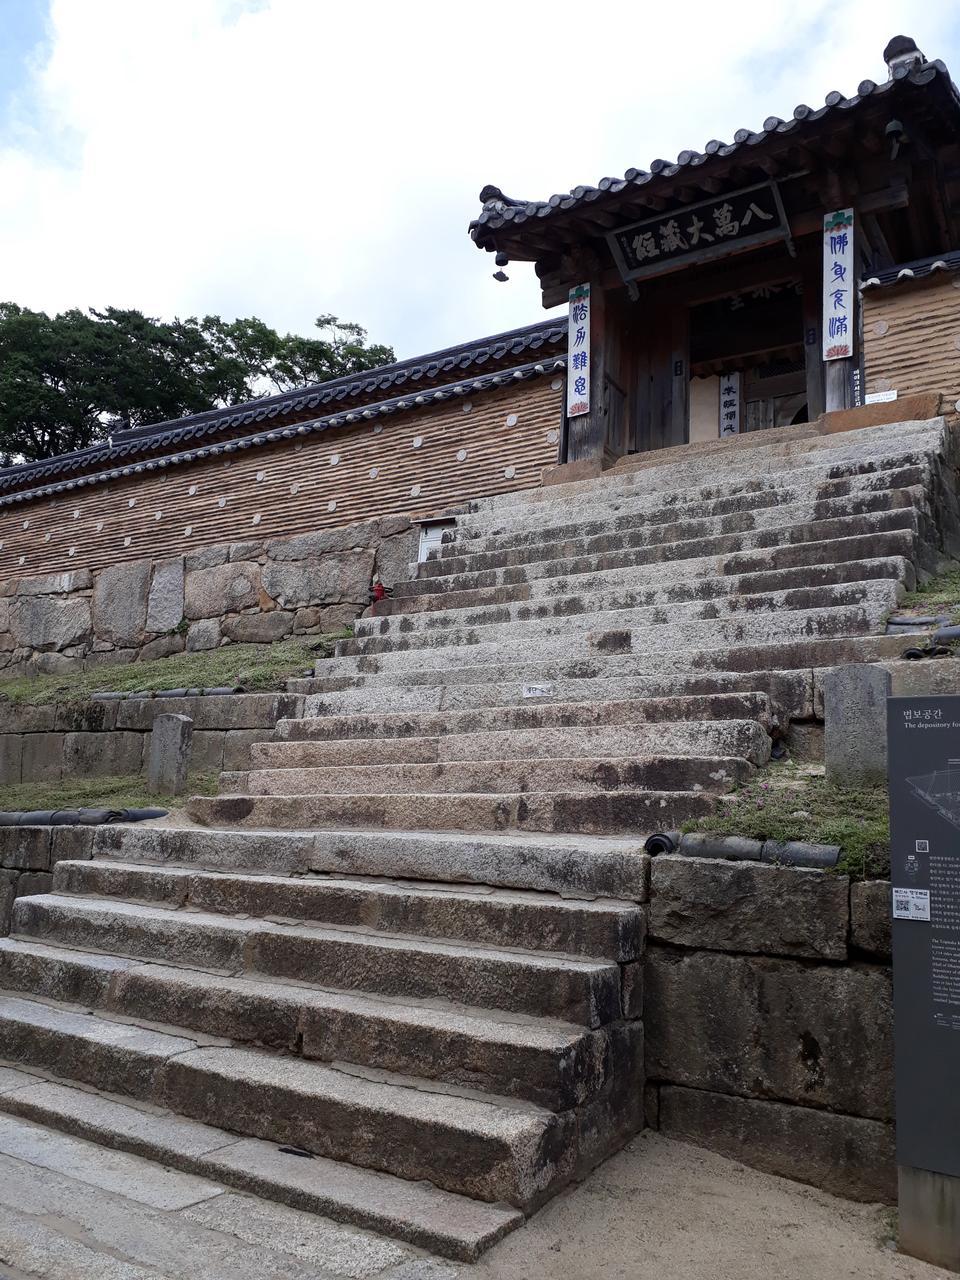 The Tripiṭaka Koreana or Palman Daejanggyeong  in South Korea